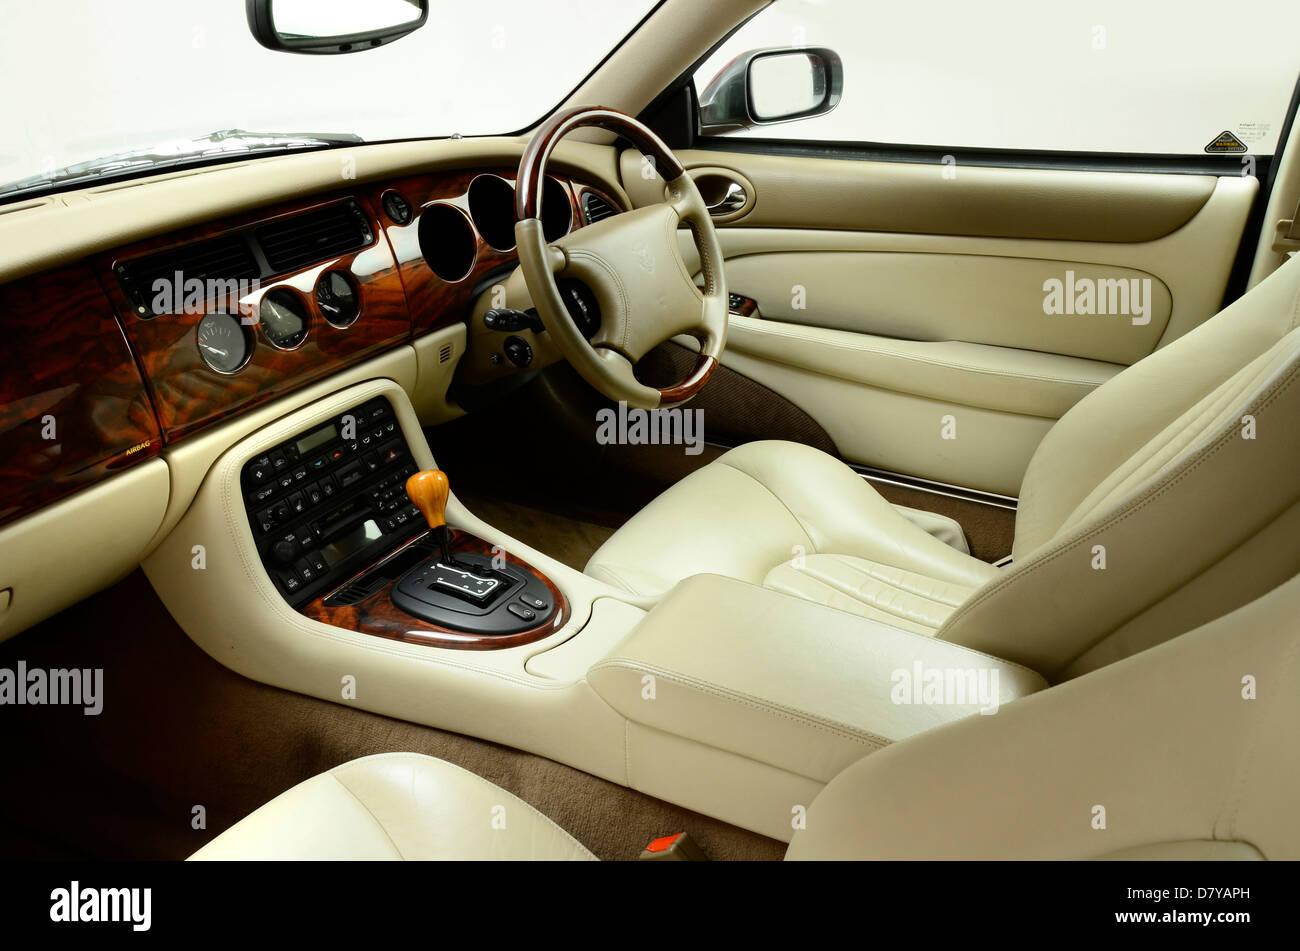 1999 Jaguar XK8 Coupe Stock Photo